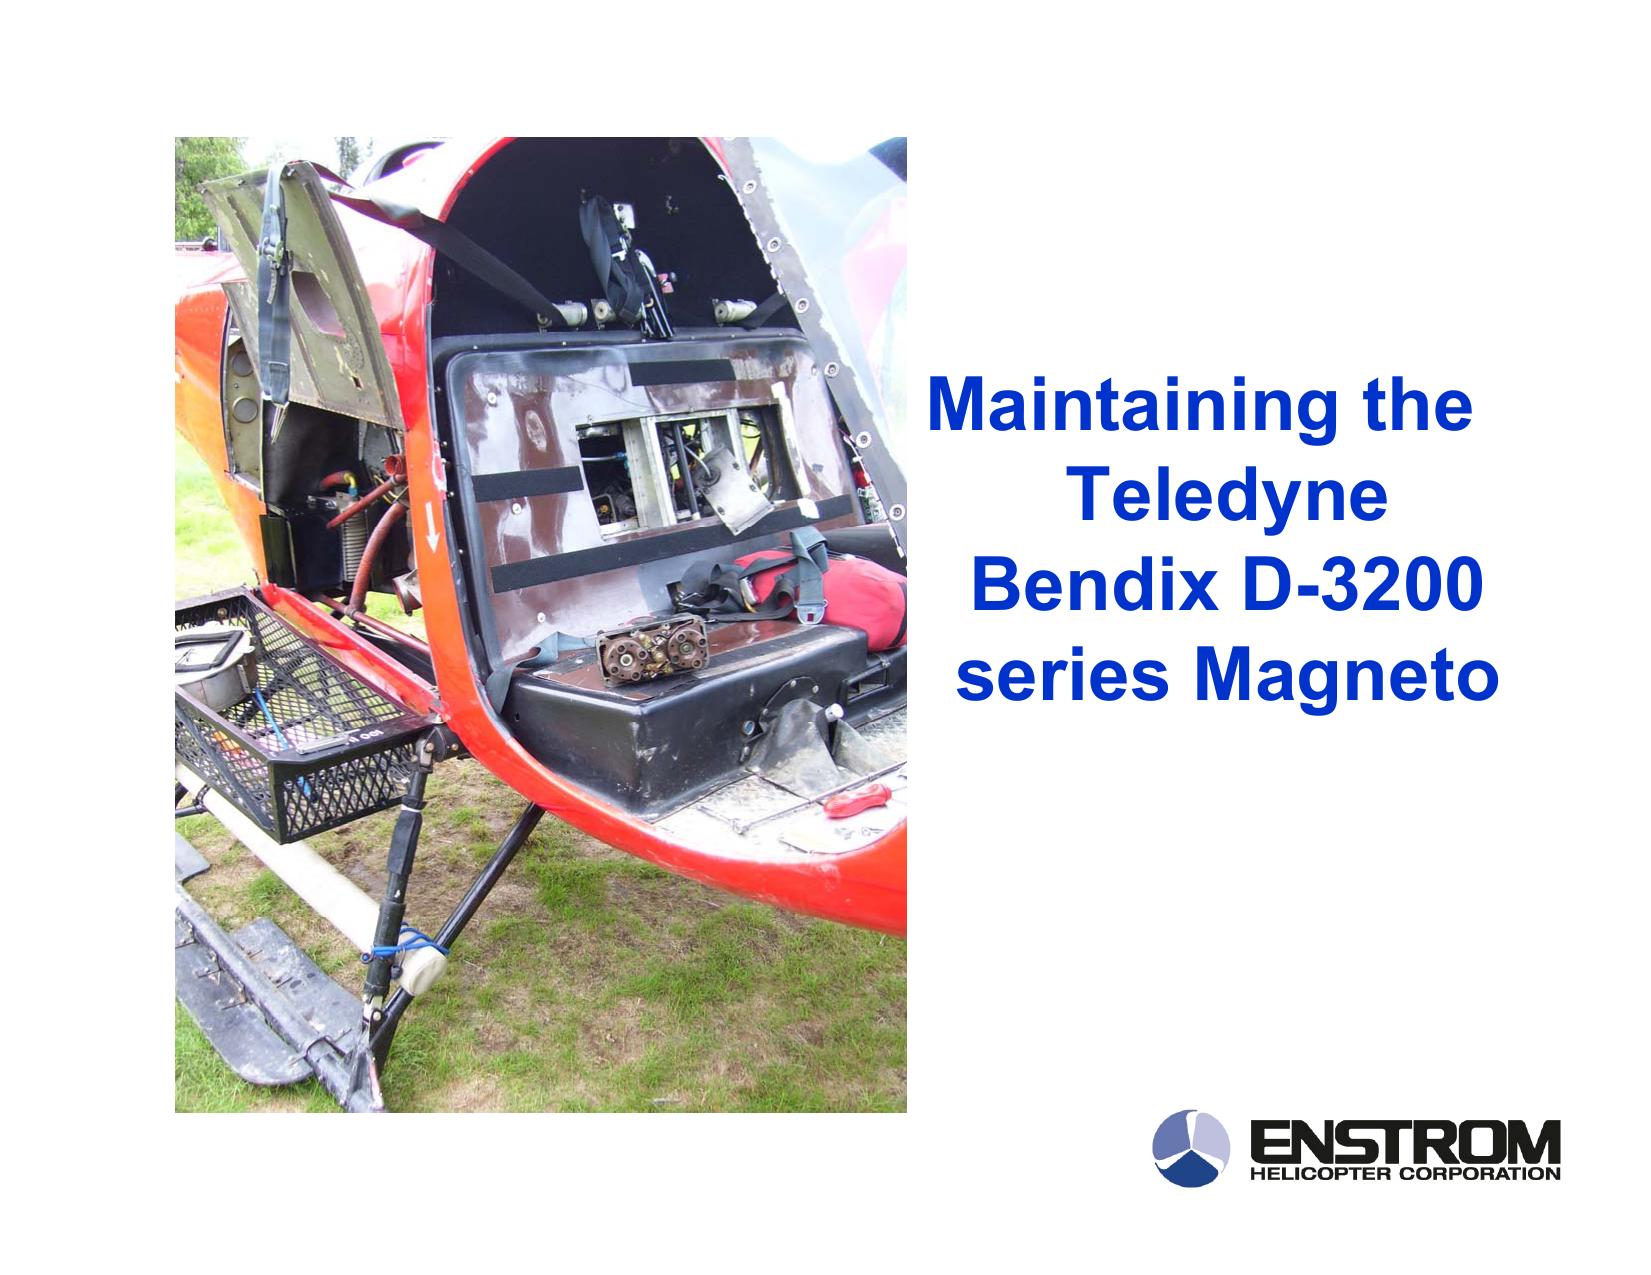 Maintaining the Teledyne Bendix D-3200 series Magneto